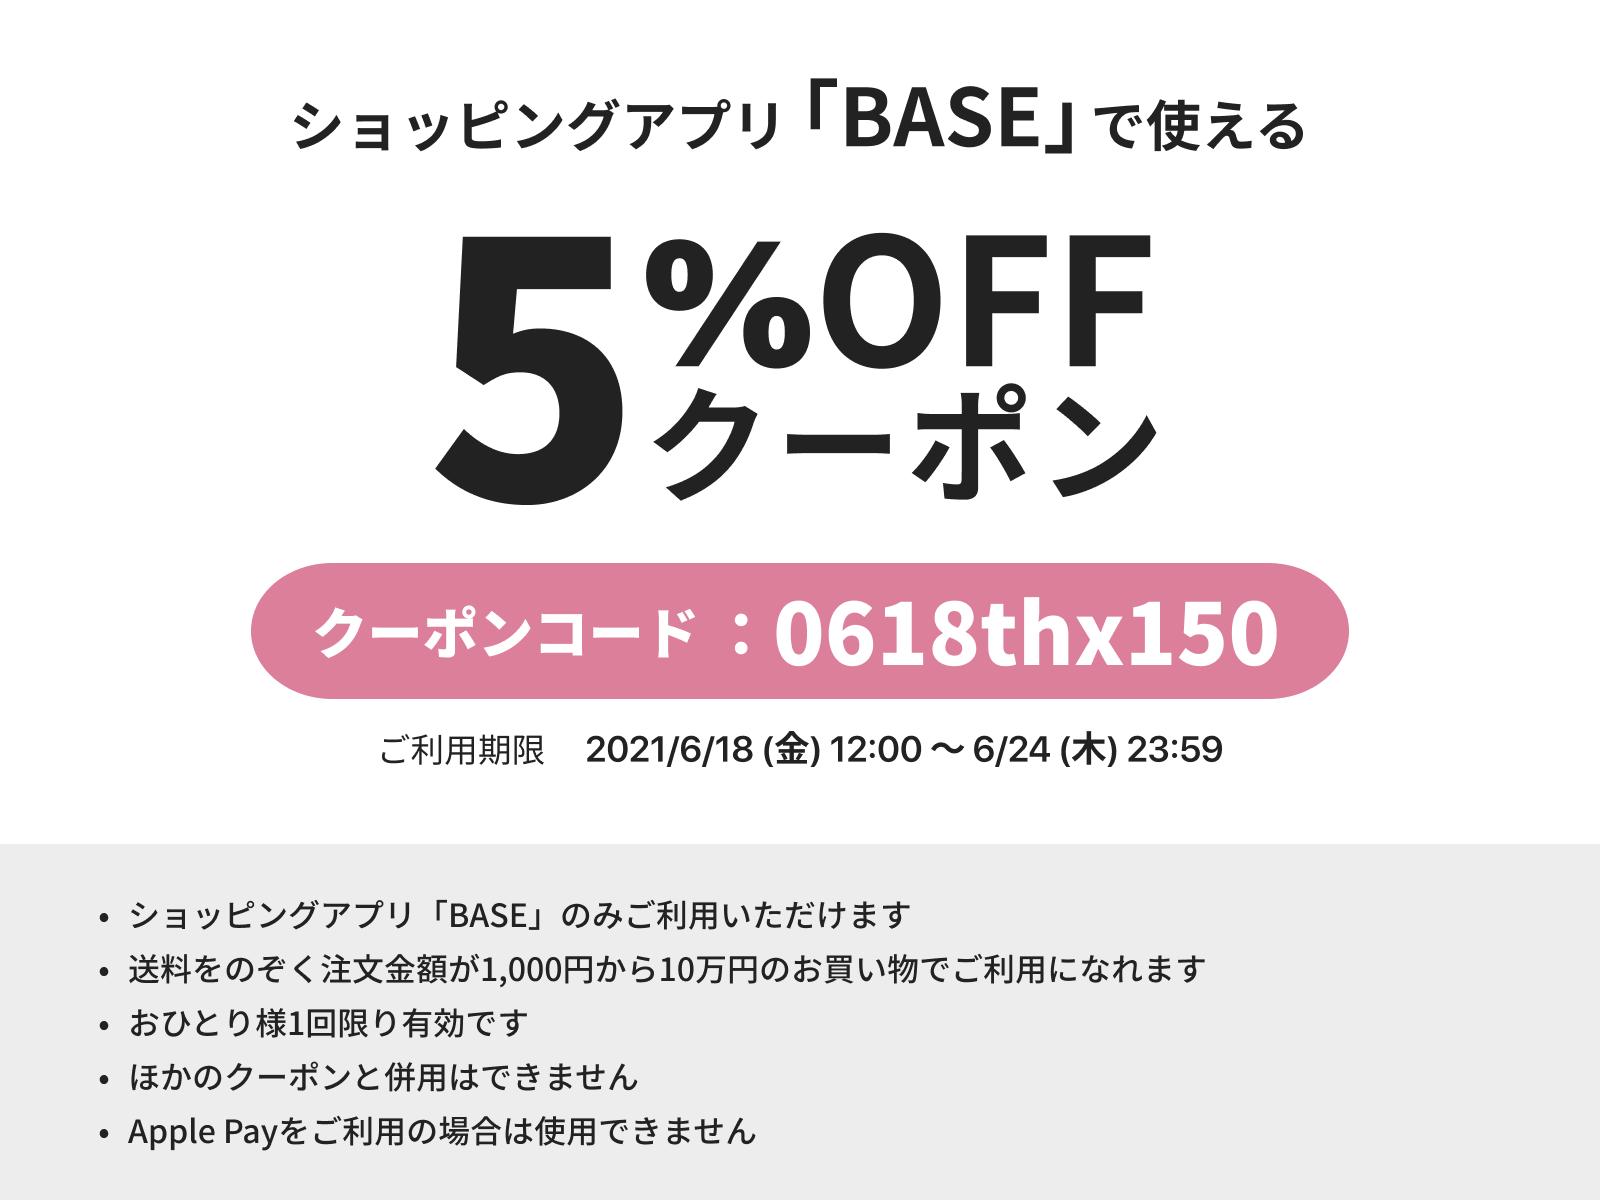 5%OFFクーポン・プレゼント中【利用期間 6/18~6/24】